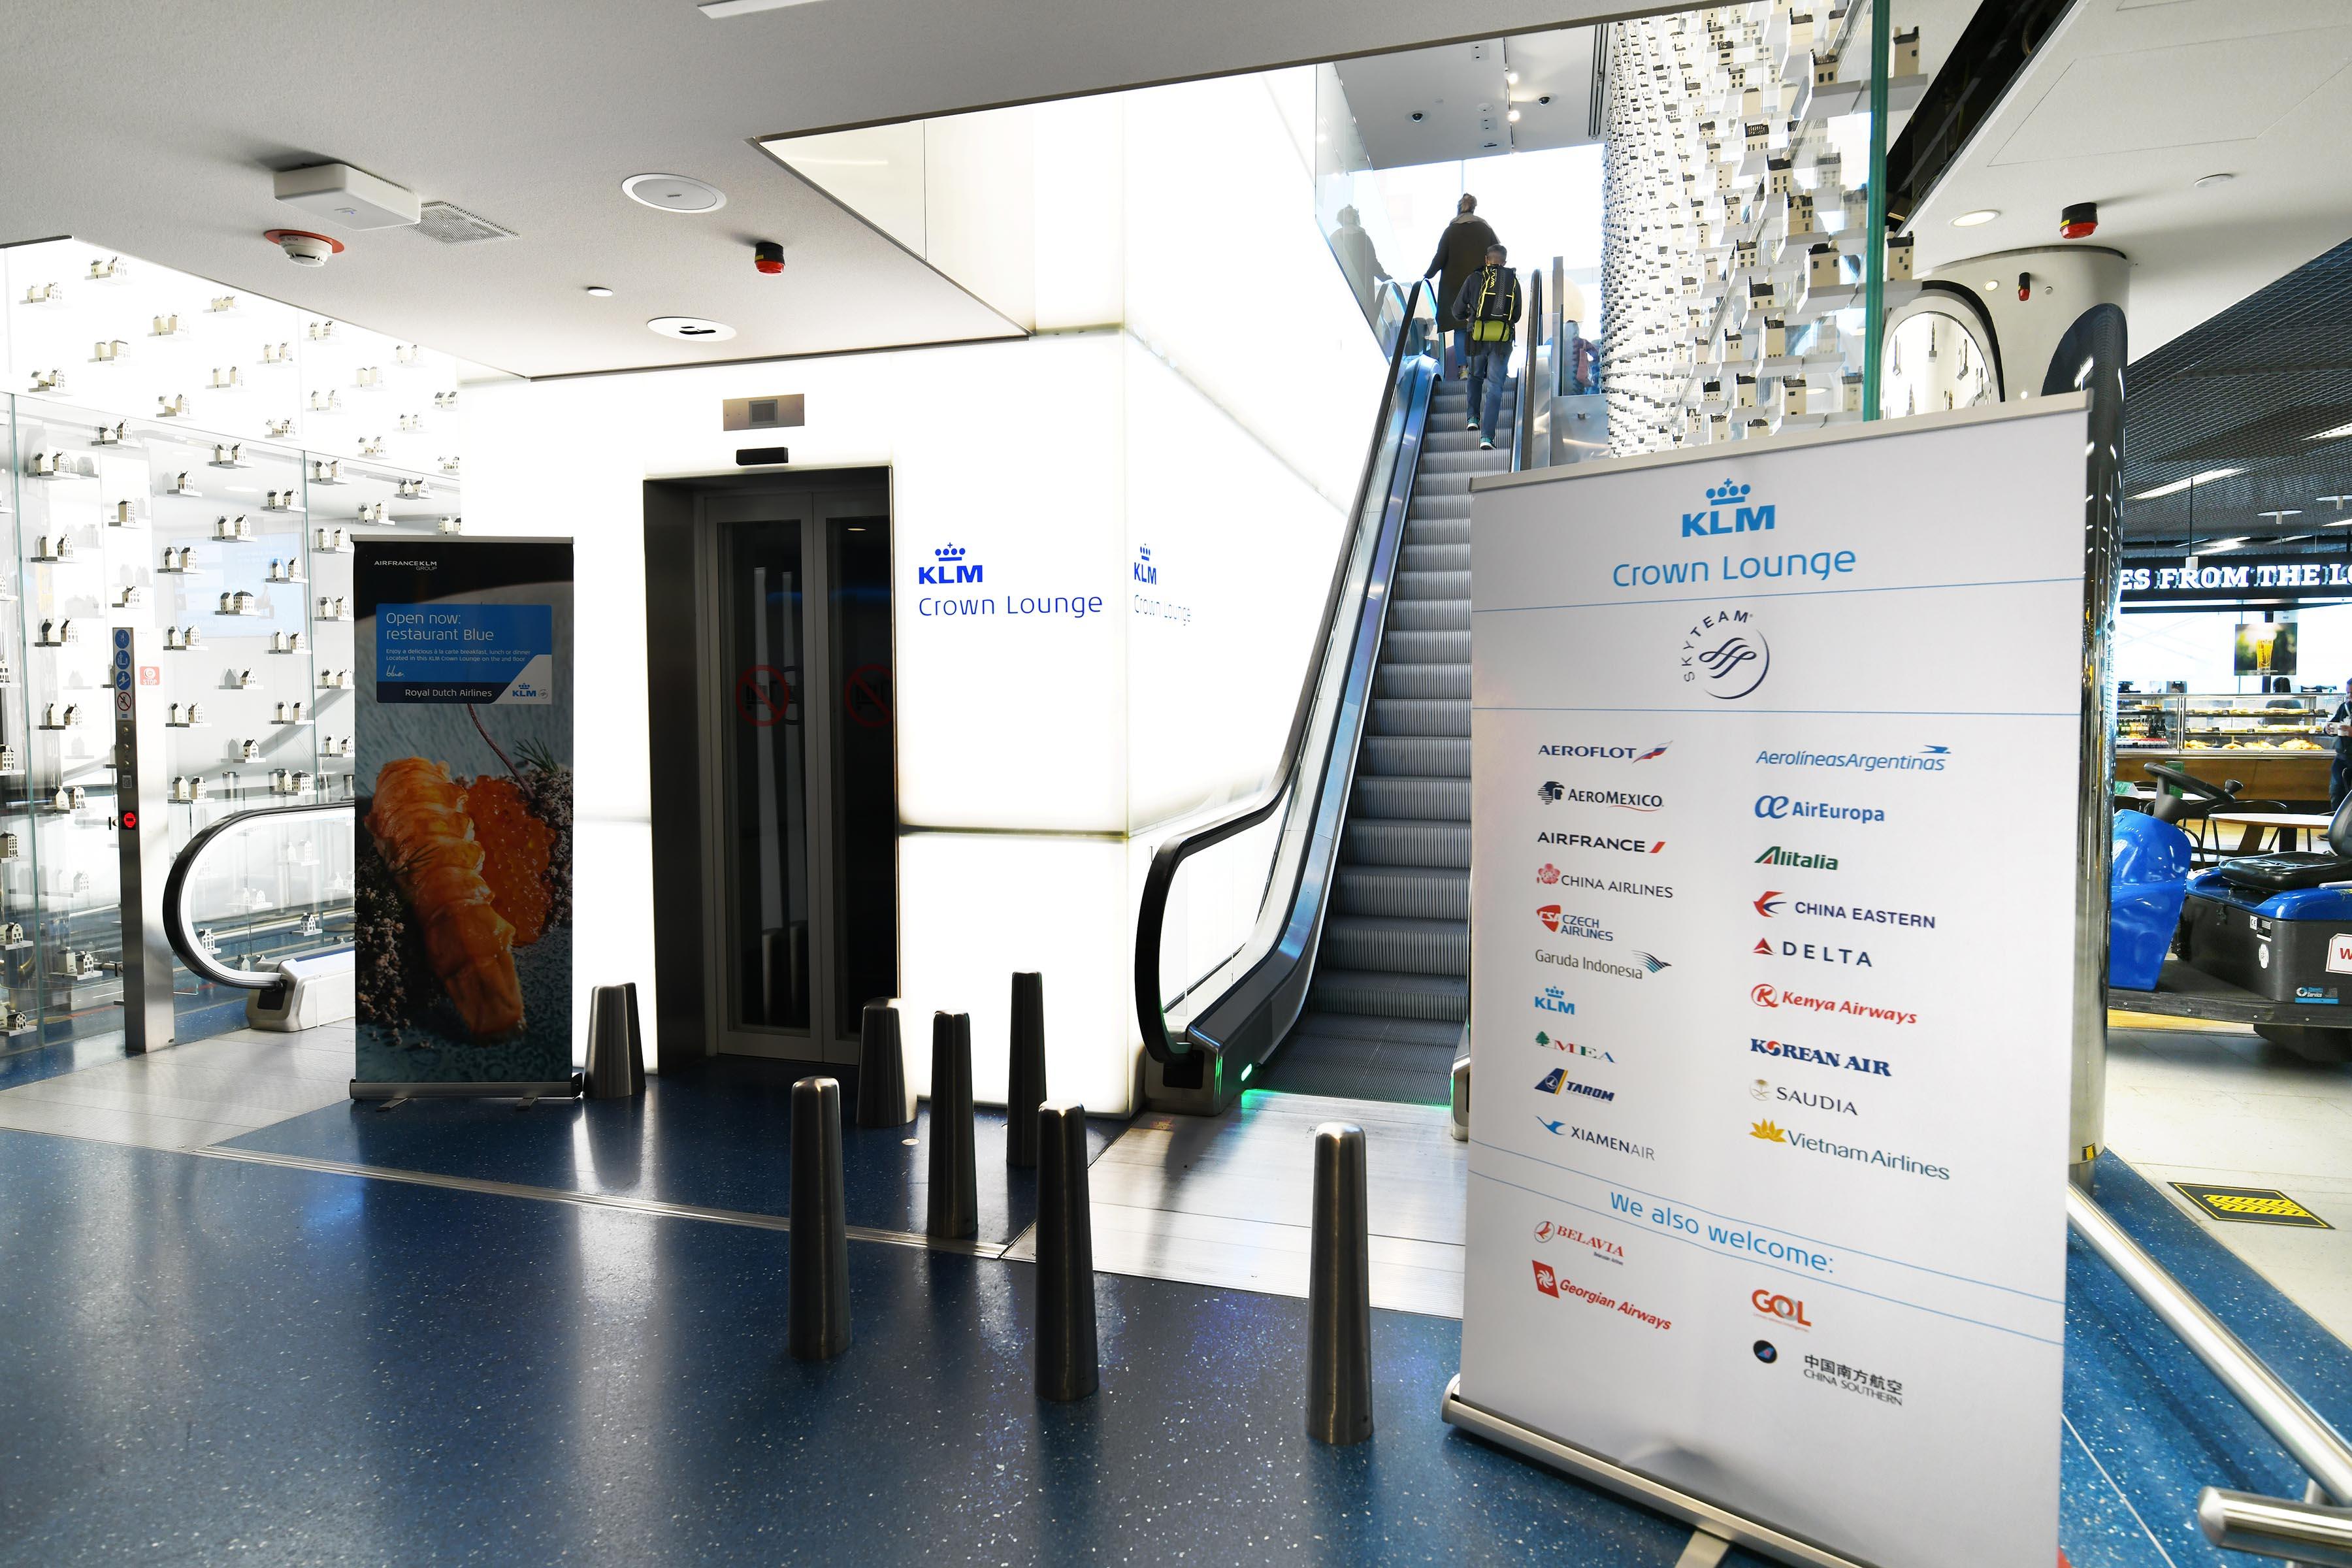 KLM-Crowne-Lounge-indvielse-2